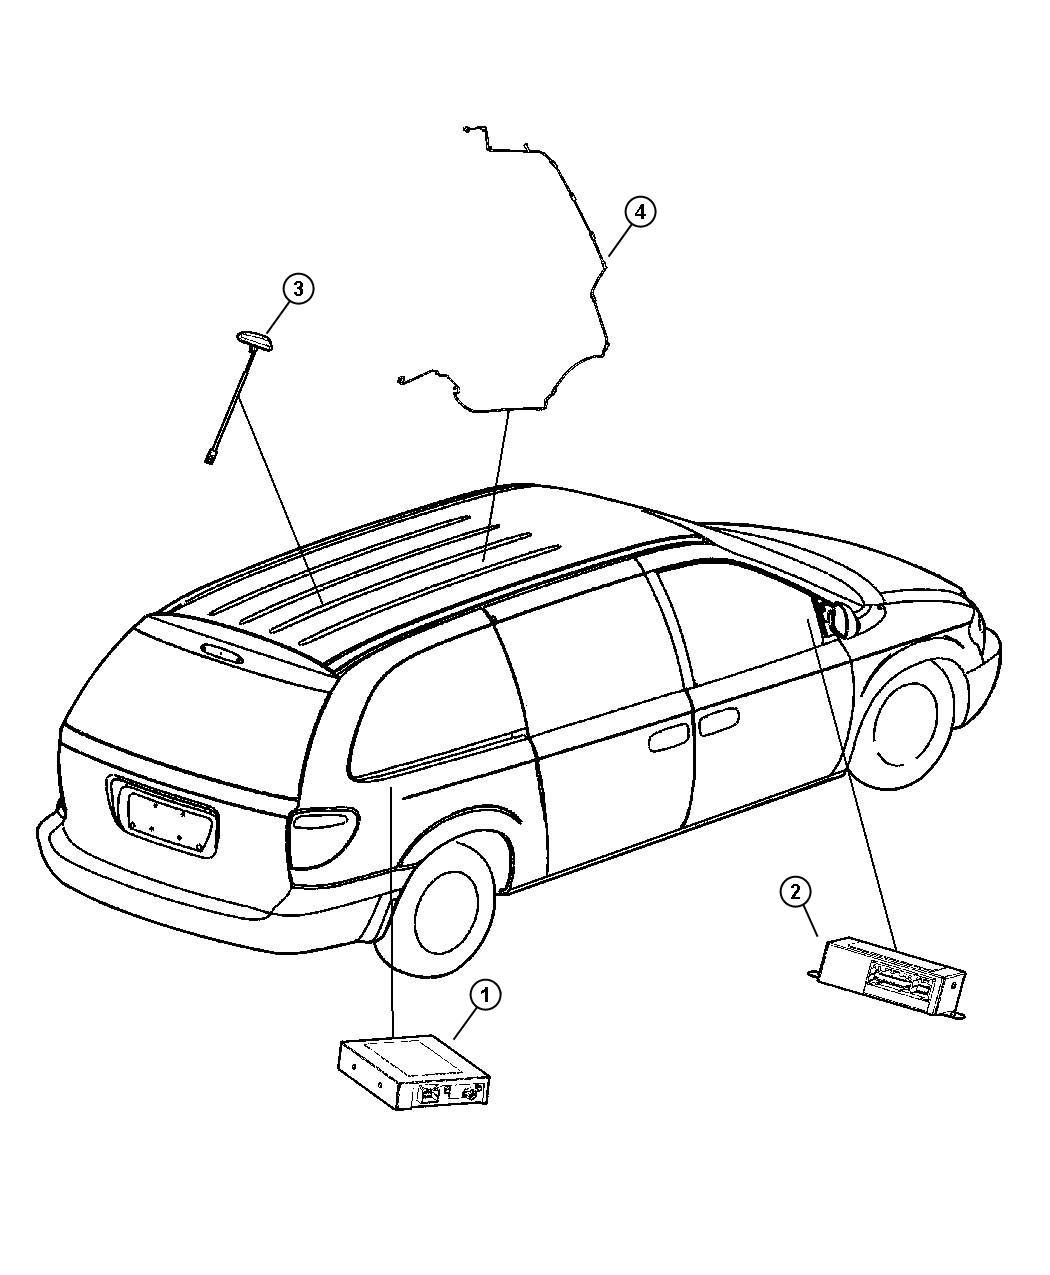 Dodge Grand Caravan Wiring Hands Free Communication